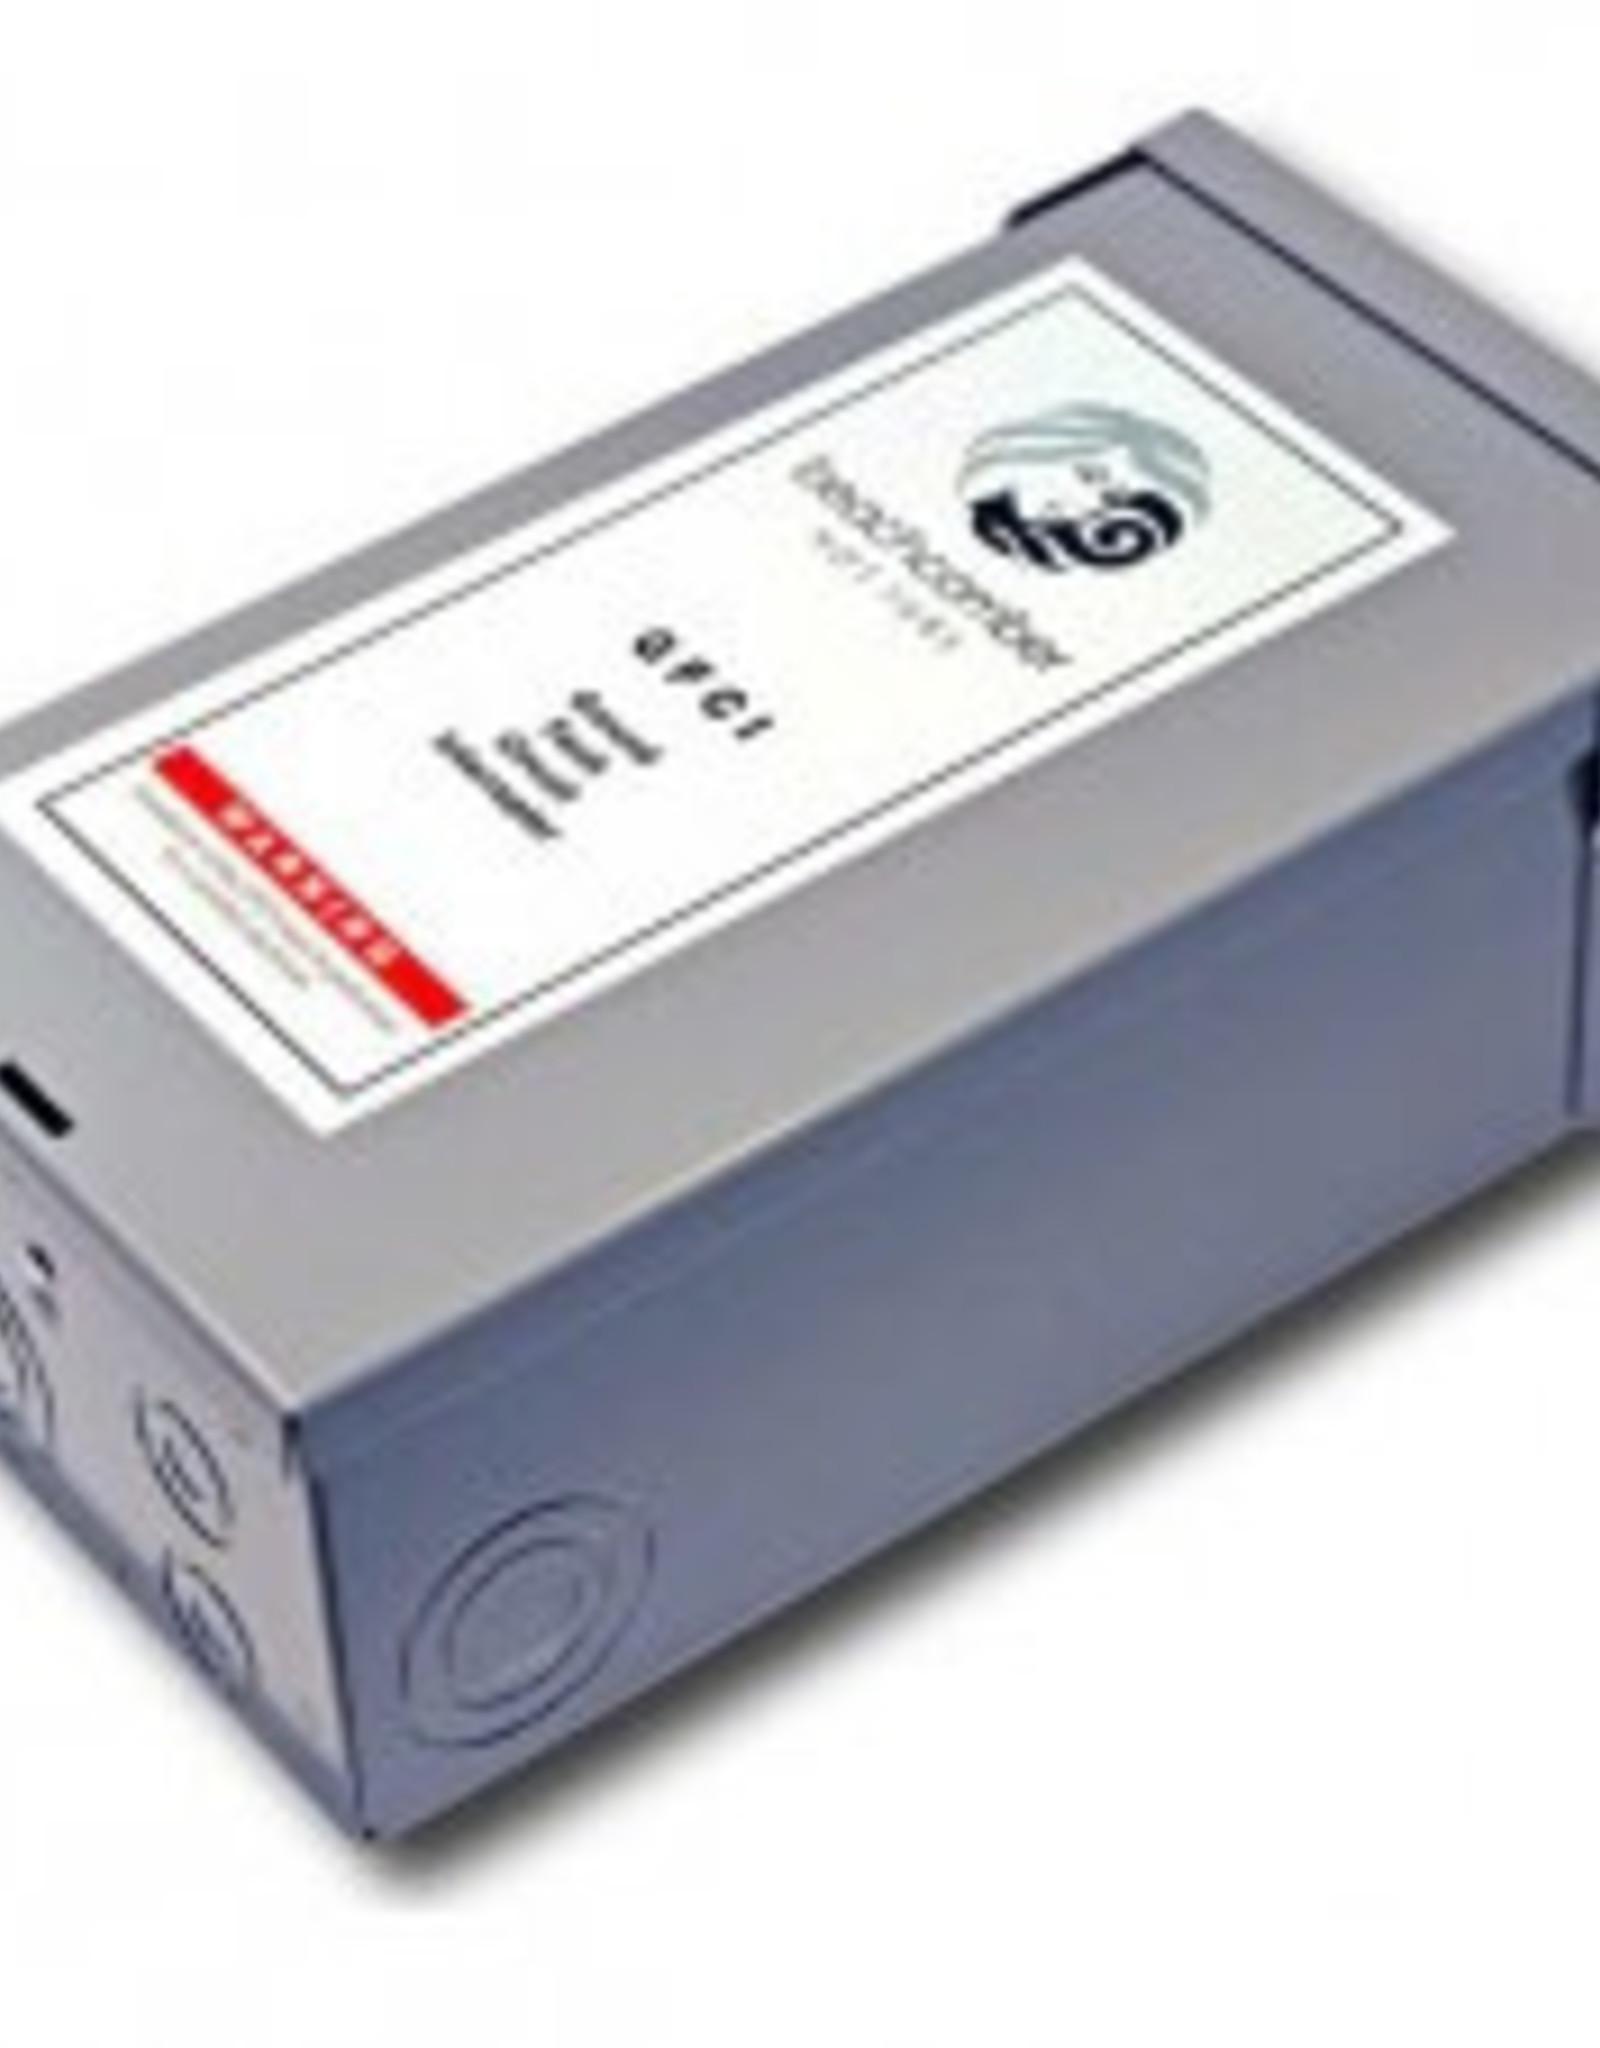 BEACHCOMBER BEACHCOMBER GFCI 40 AMP